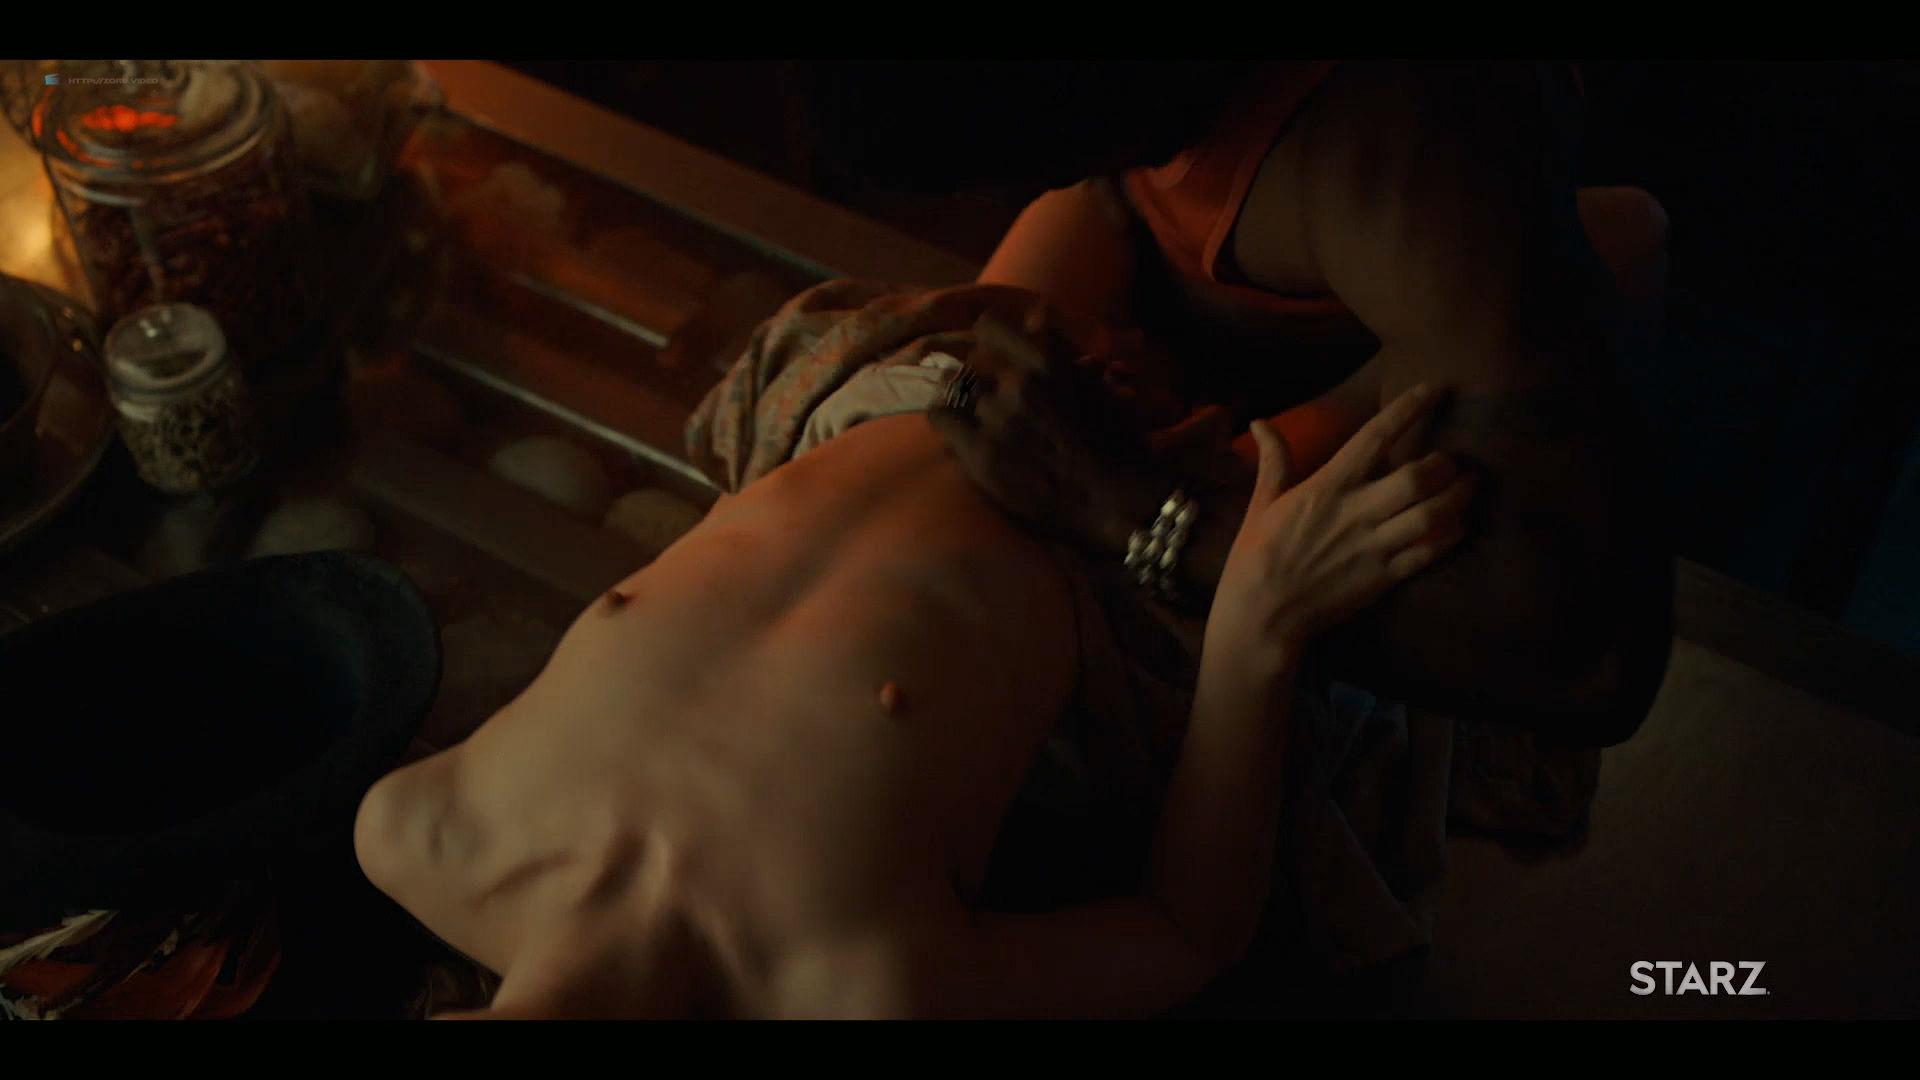 Emily Browning nude hot sex Hani Furstenberg nude sex too - American Gods (2019) s2e5 HD 1080p (7)